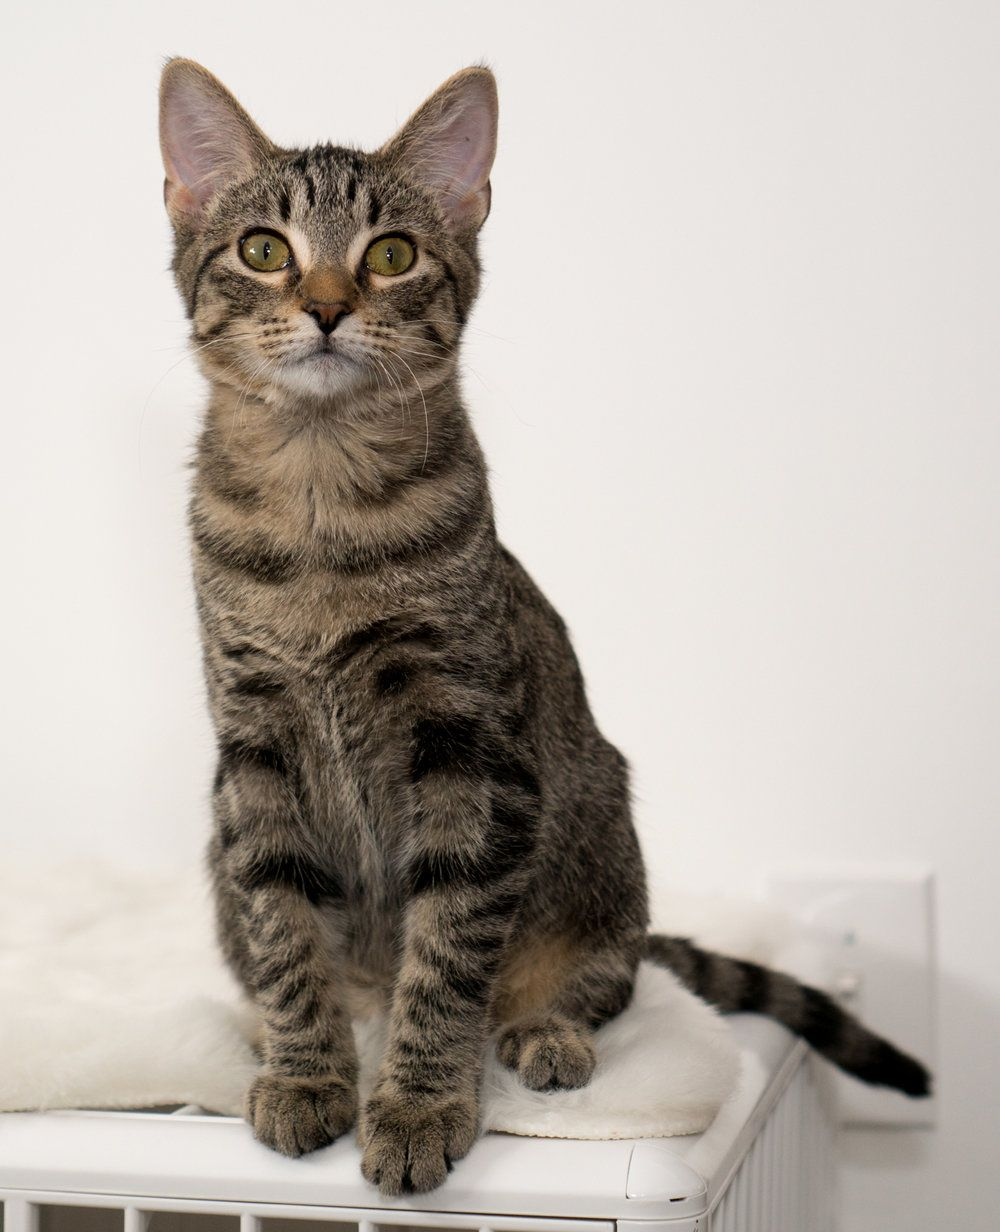 Chestnut Adoptable Kittens From Kitten Academy Kitten Cat Day Cats